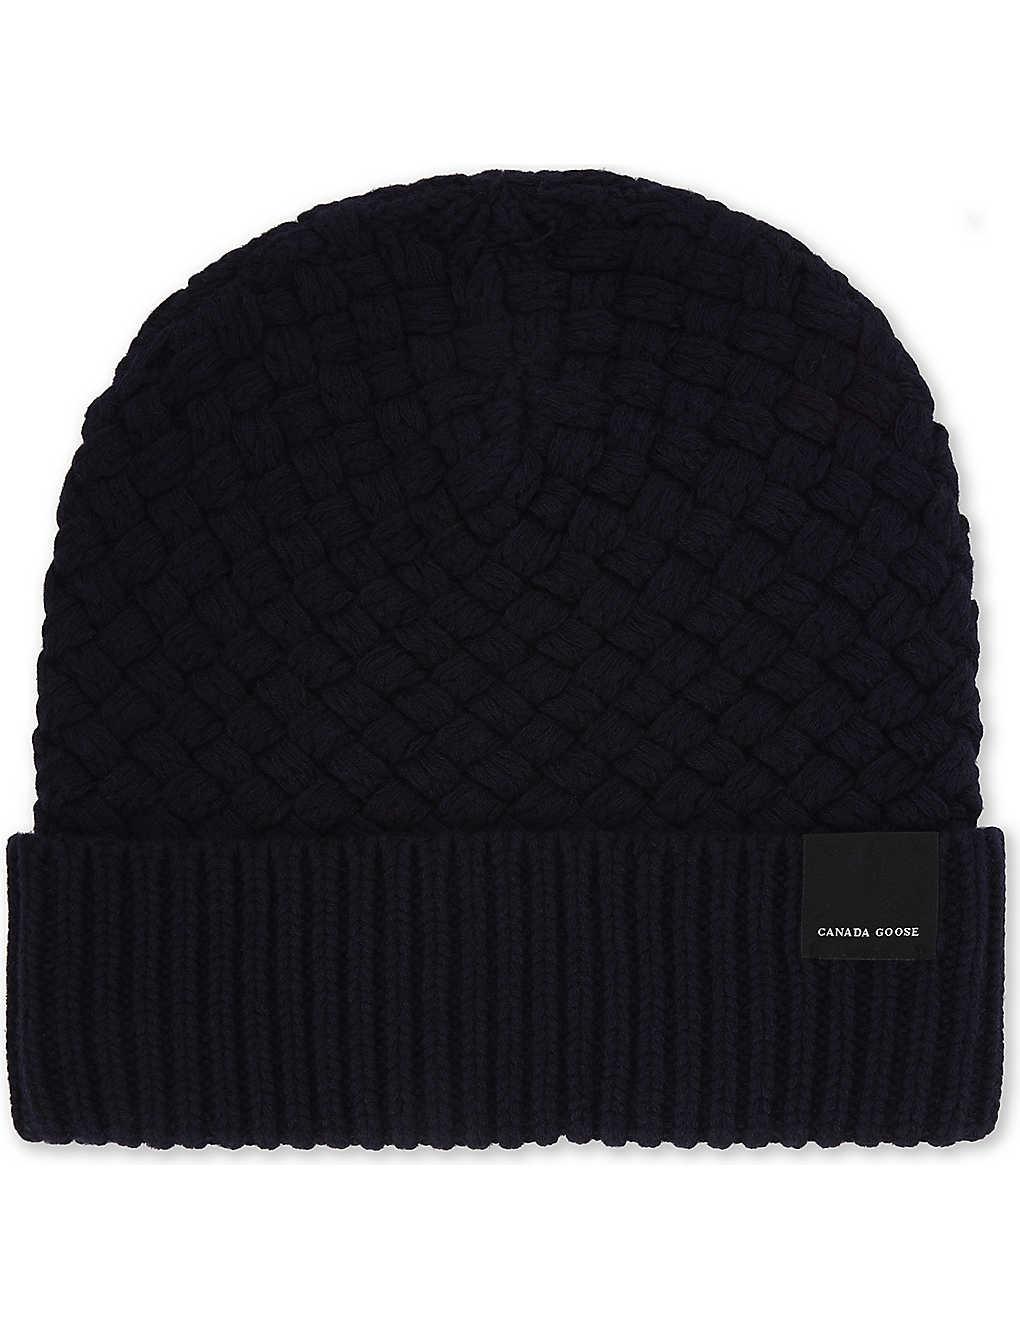 2ce2178a01b75a CANADA GOOSE - Basket stitch wool hat | Selfridges.com